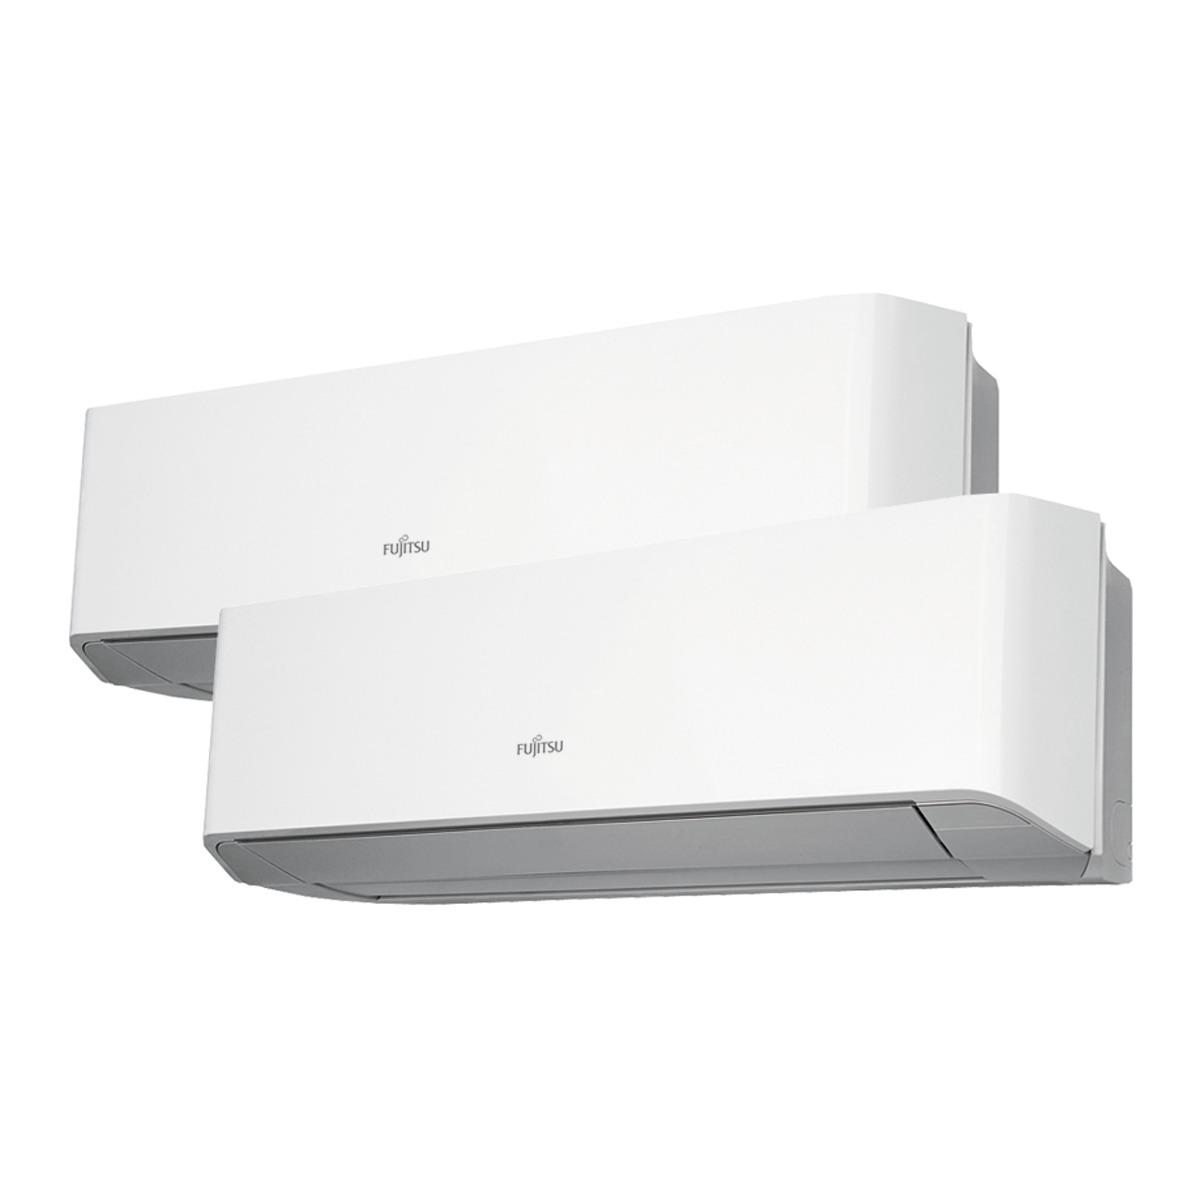 Fujitsu (ASY20 + ASY 35 ) MI-LMC+ AOY50UI-Mi2